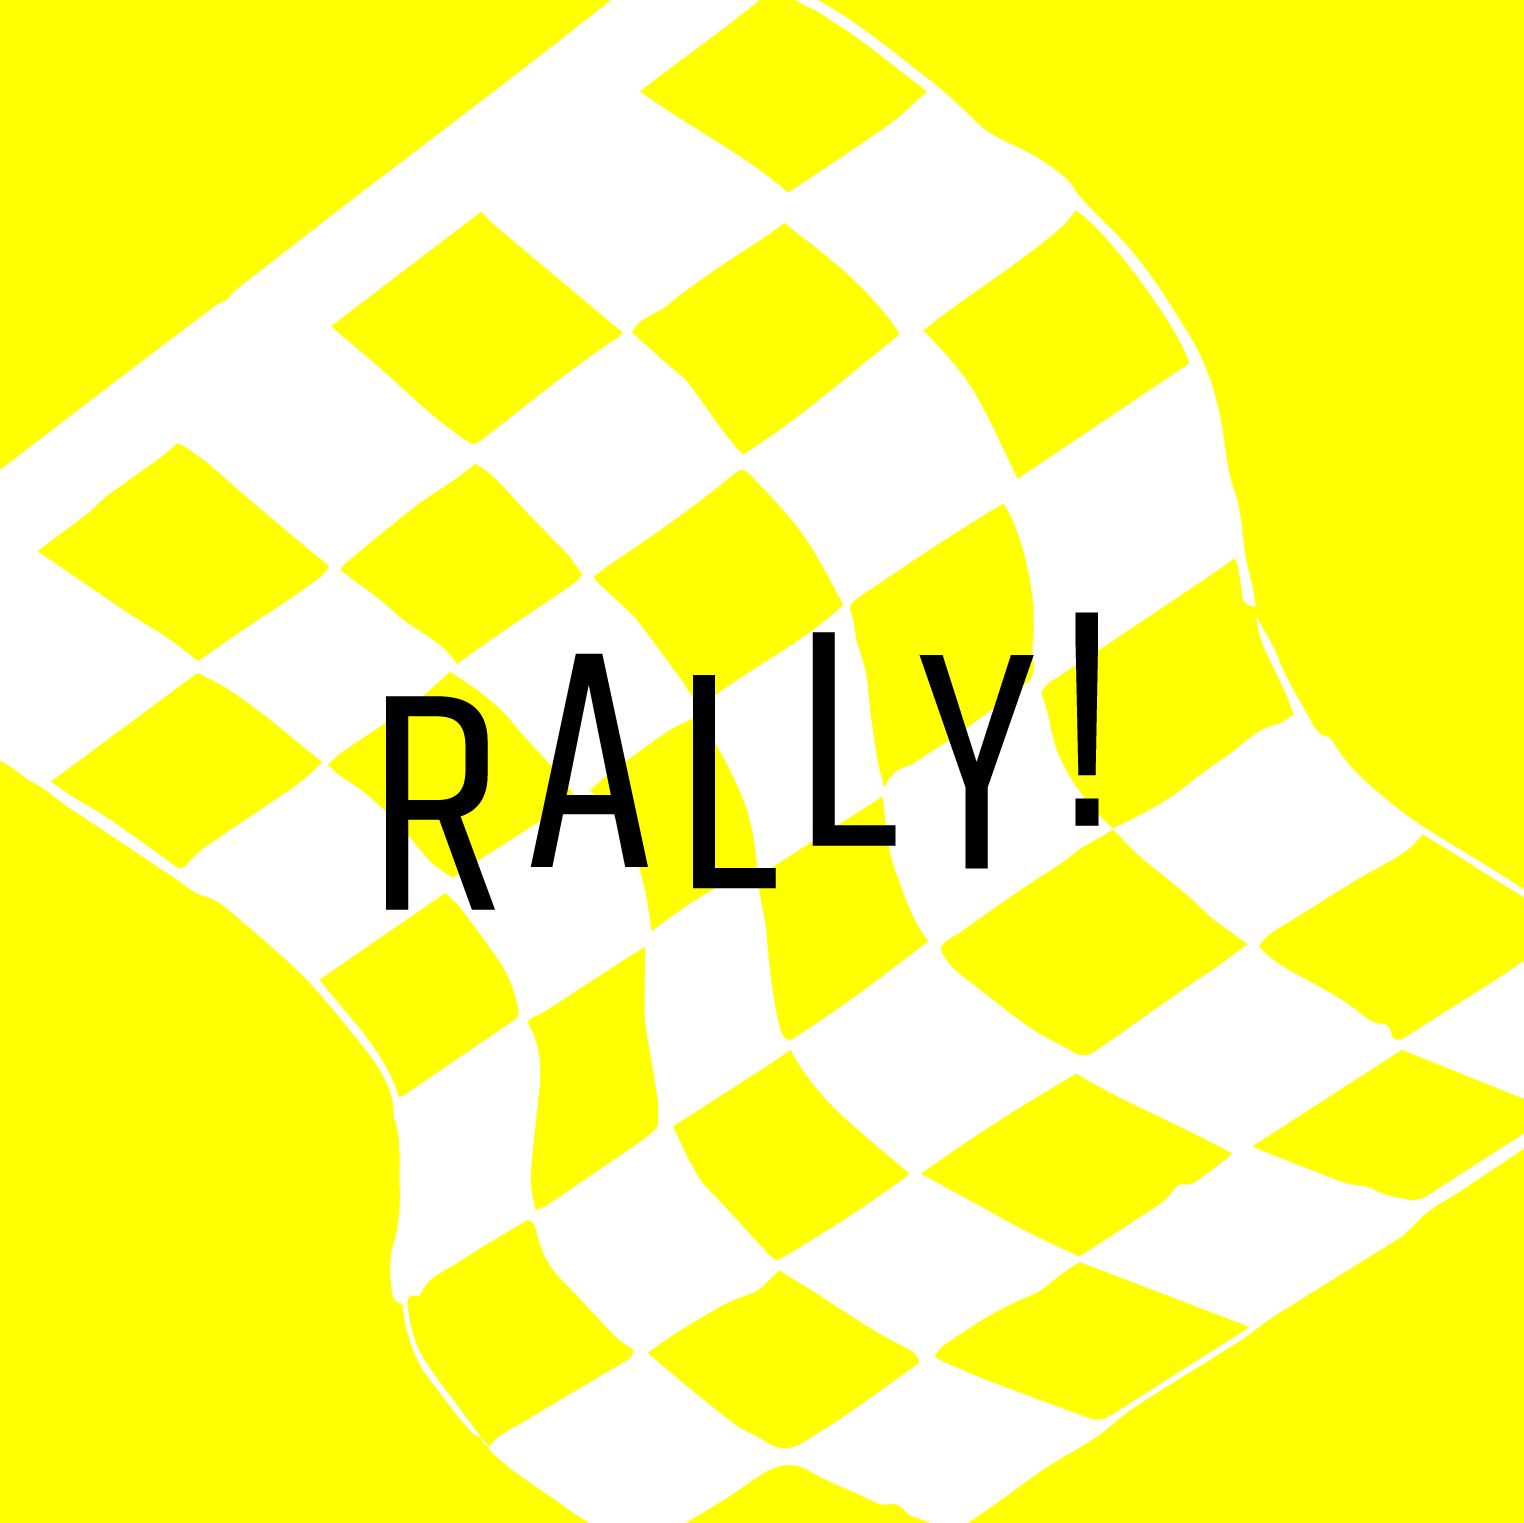 Rally-1x1.jpg